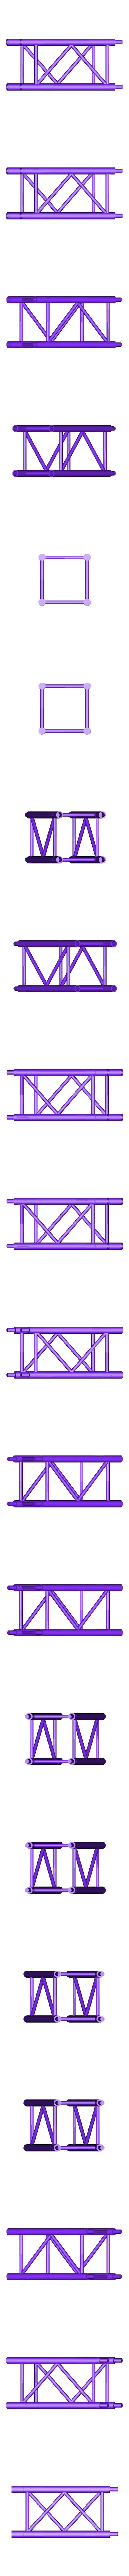 Truss 4 Punkt Traverse GWK35 (x12).stl Download STL file 1:18 Truss 4 Punkt Traverse Messestand ZSB1000 • Template to 3D print, CrossModellbau